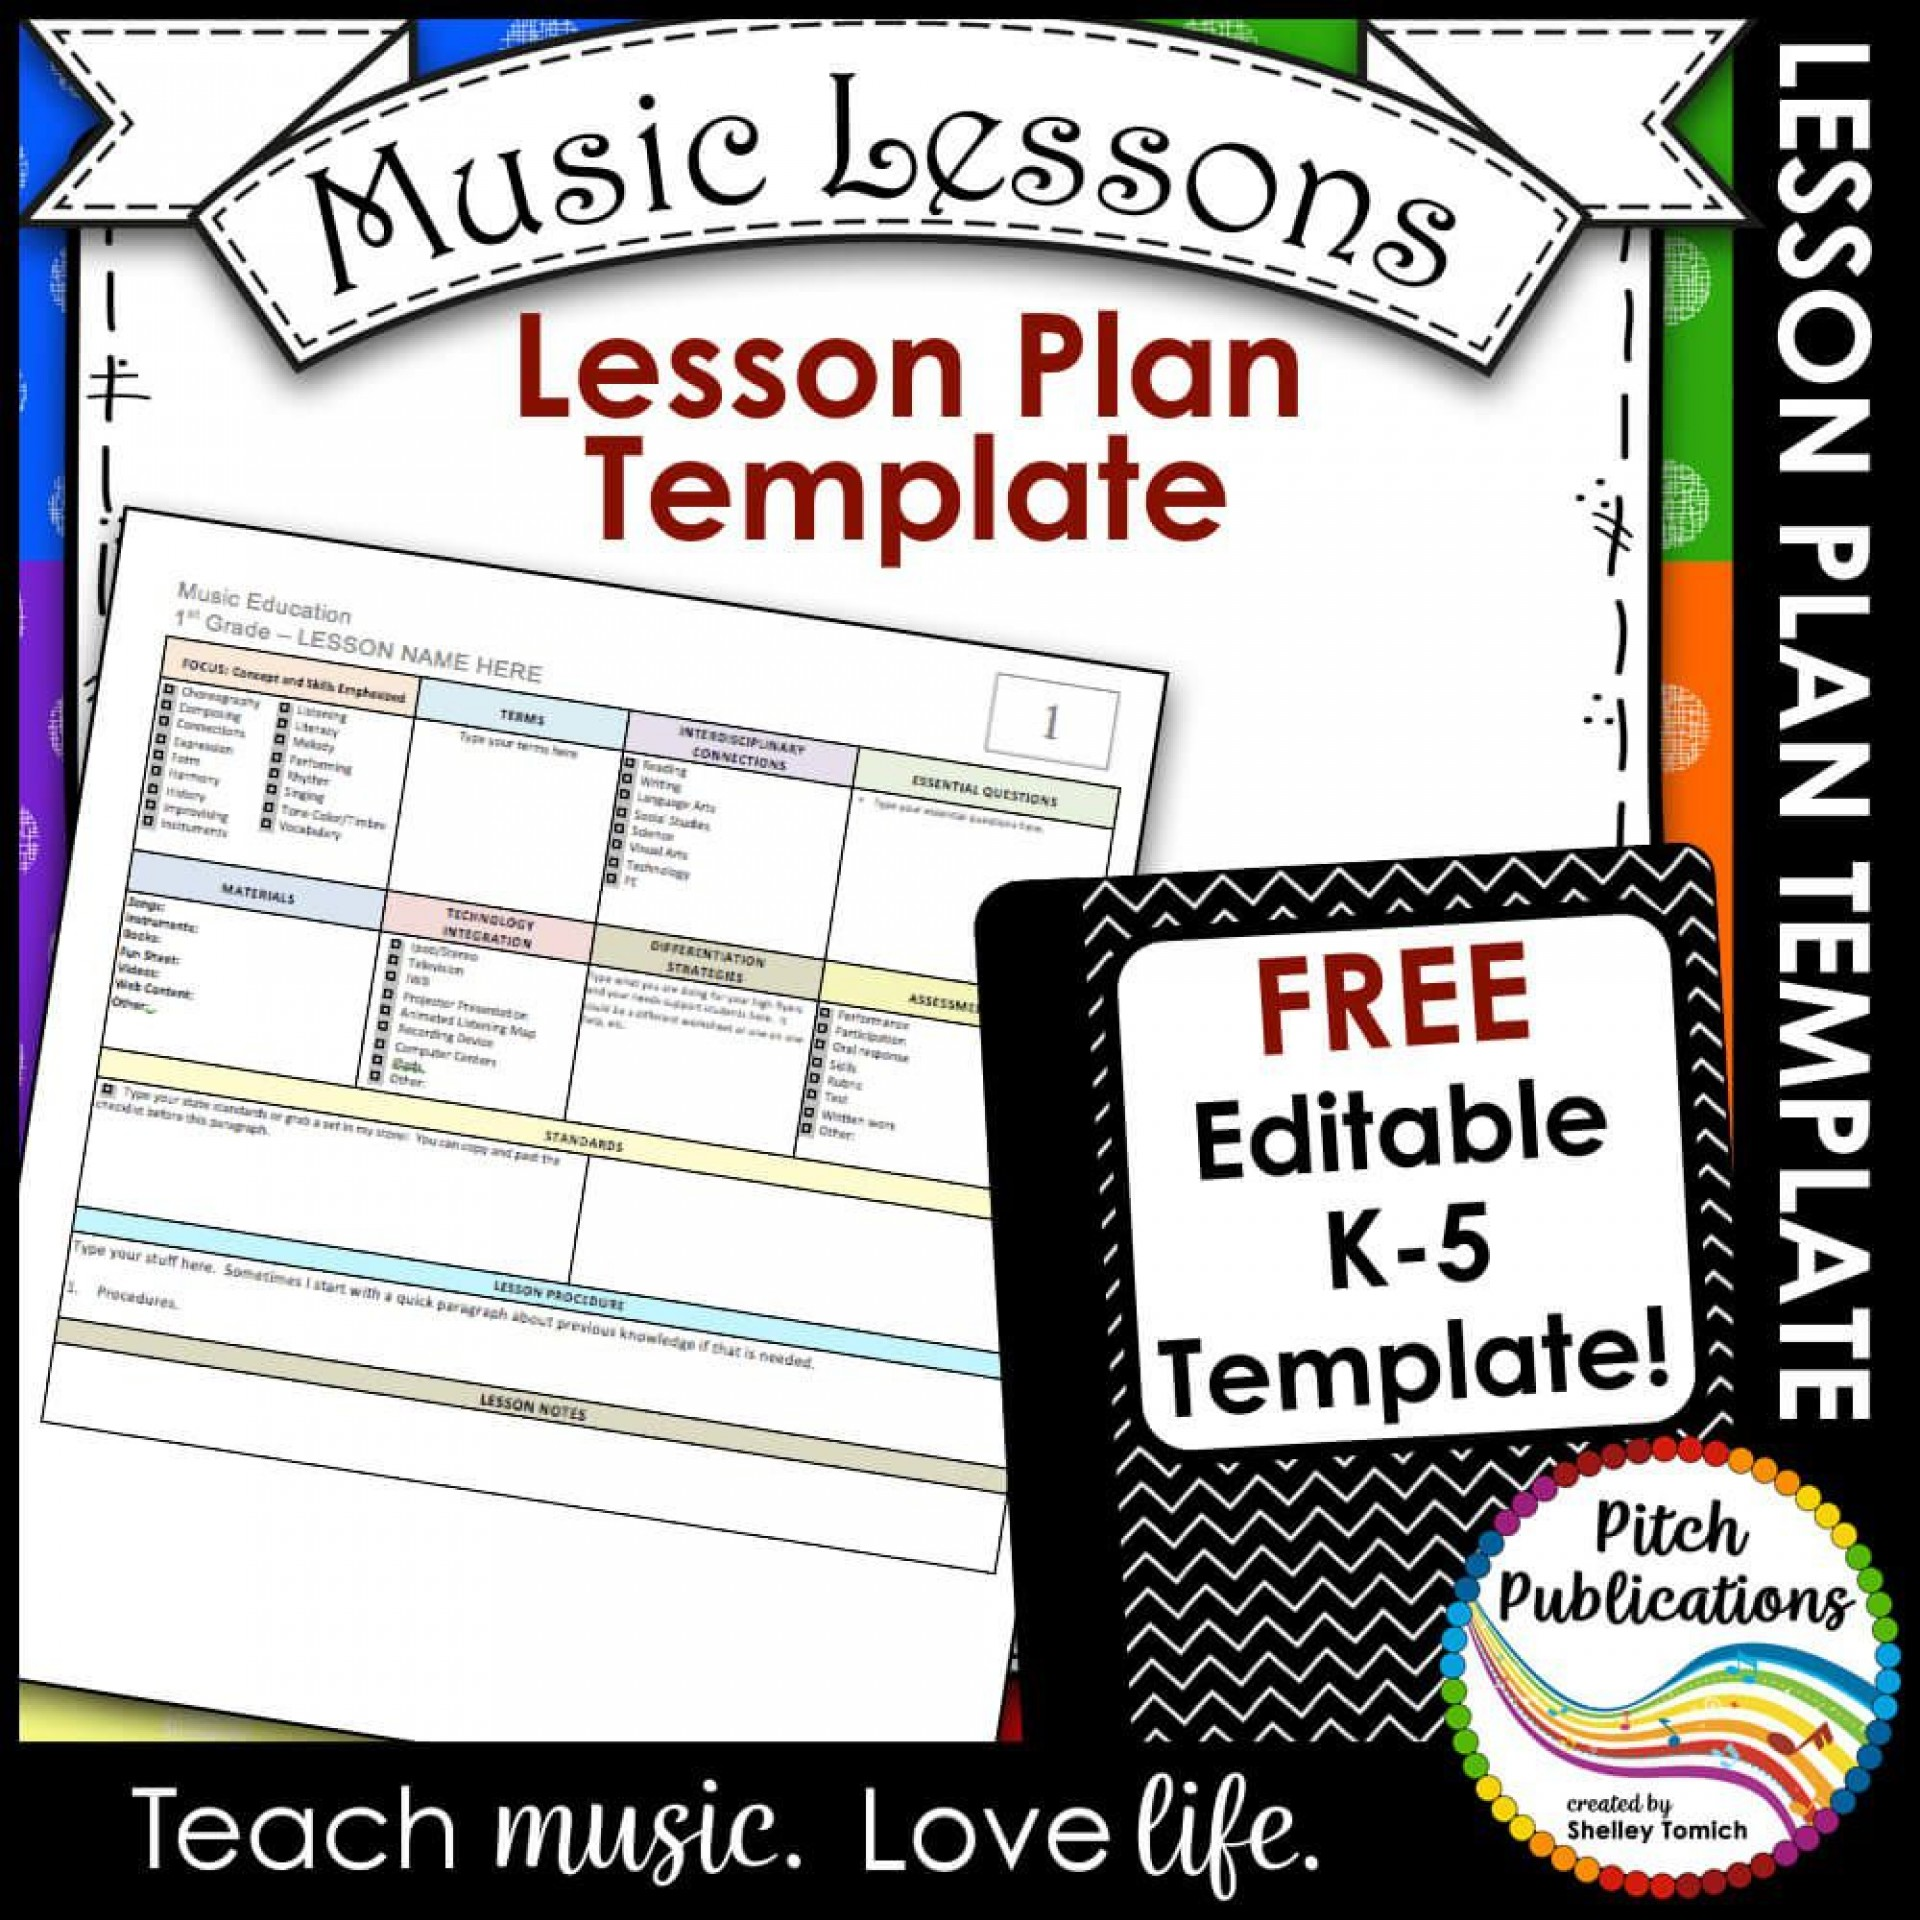 009 Striking Lesson Plan Template Free Highest Quality  Weekly Printable Editable Preschool Format1920